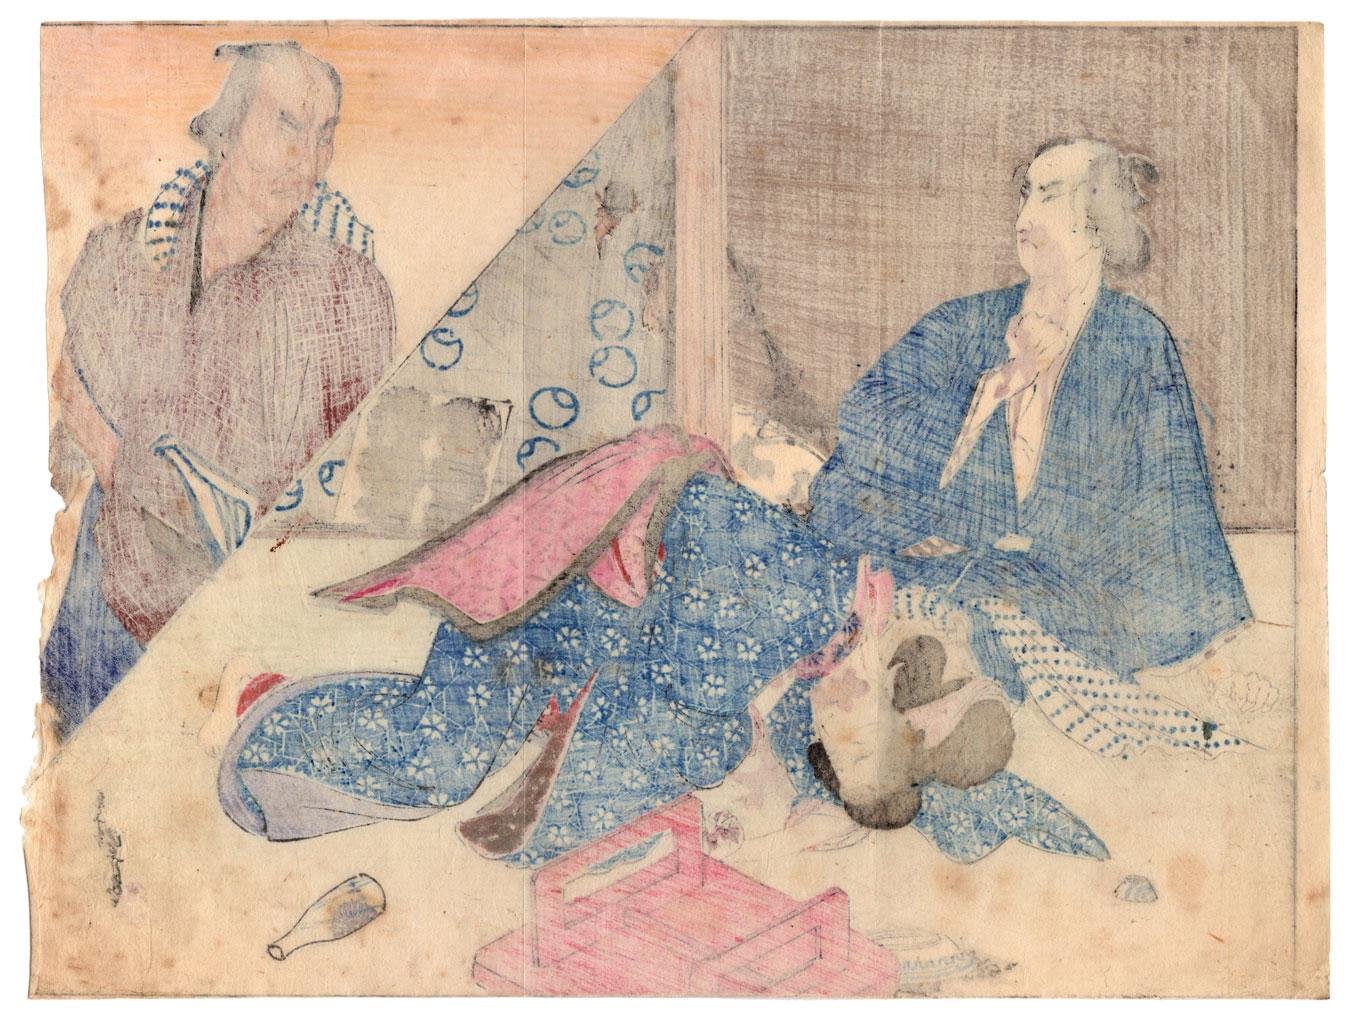 original Japanese woodblock prints and paintings